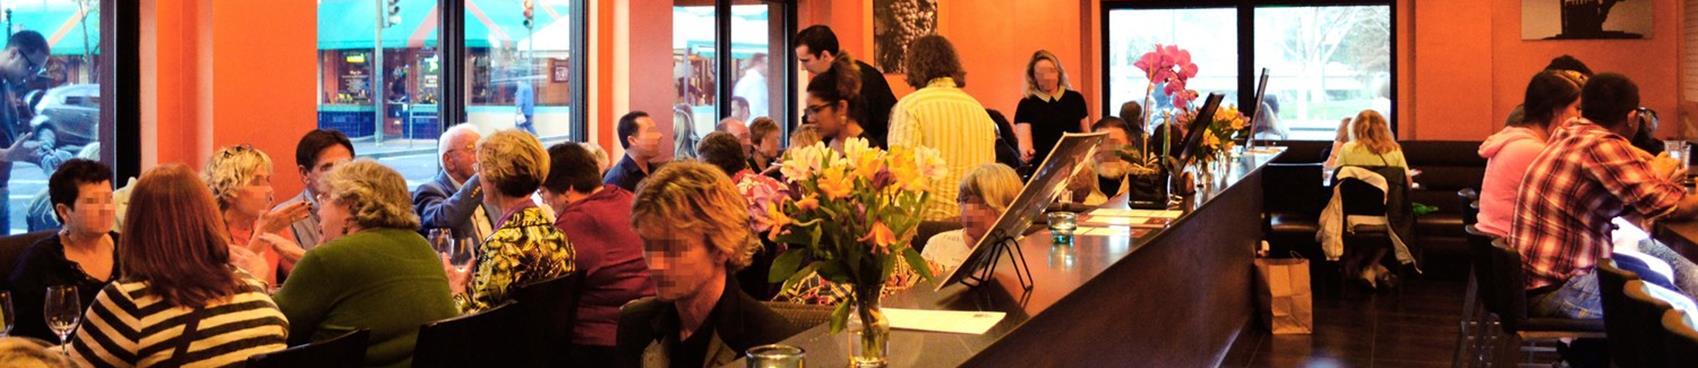 Napkins Bar & Grill